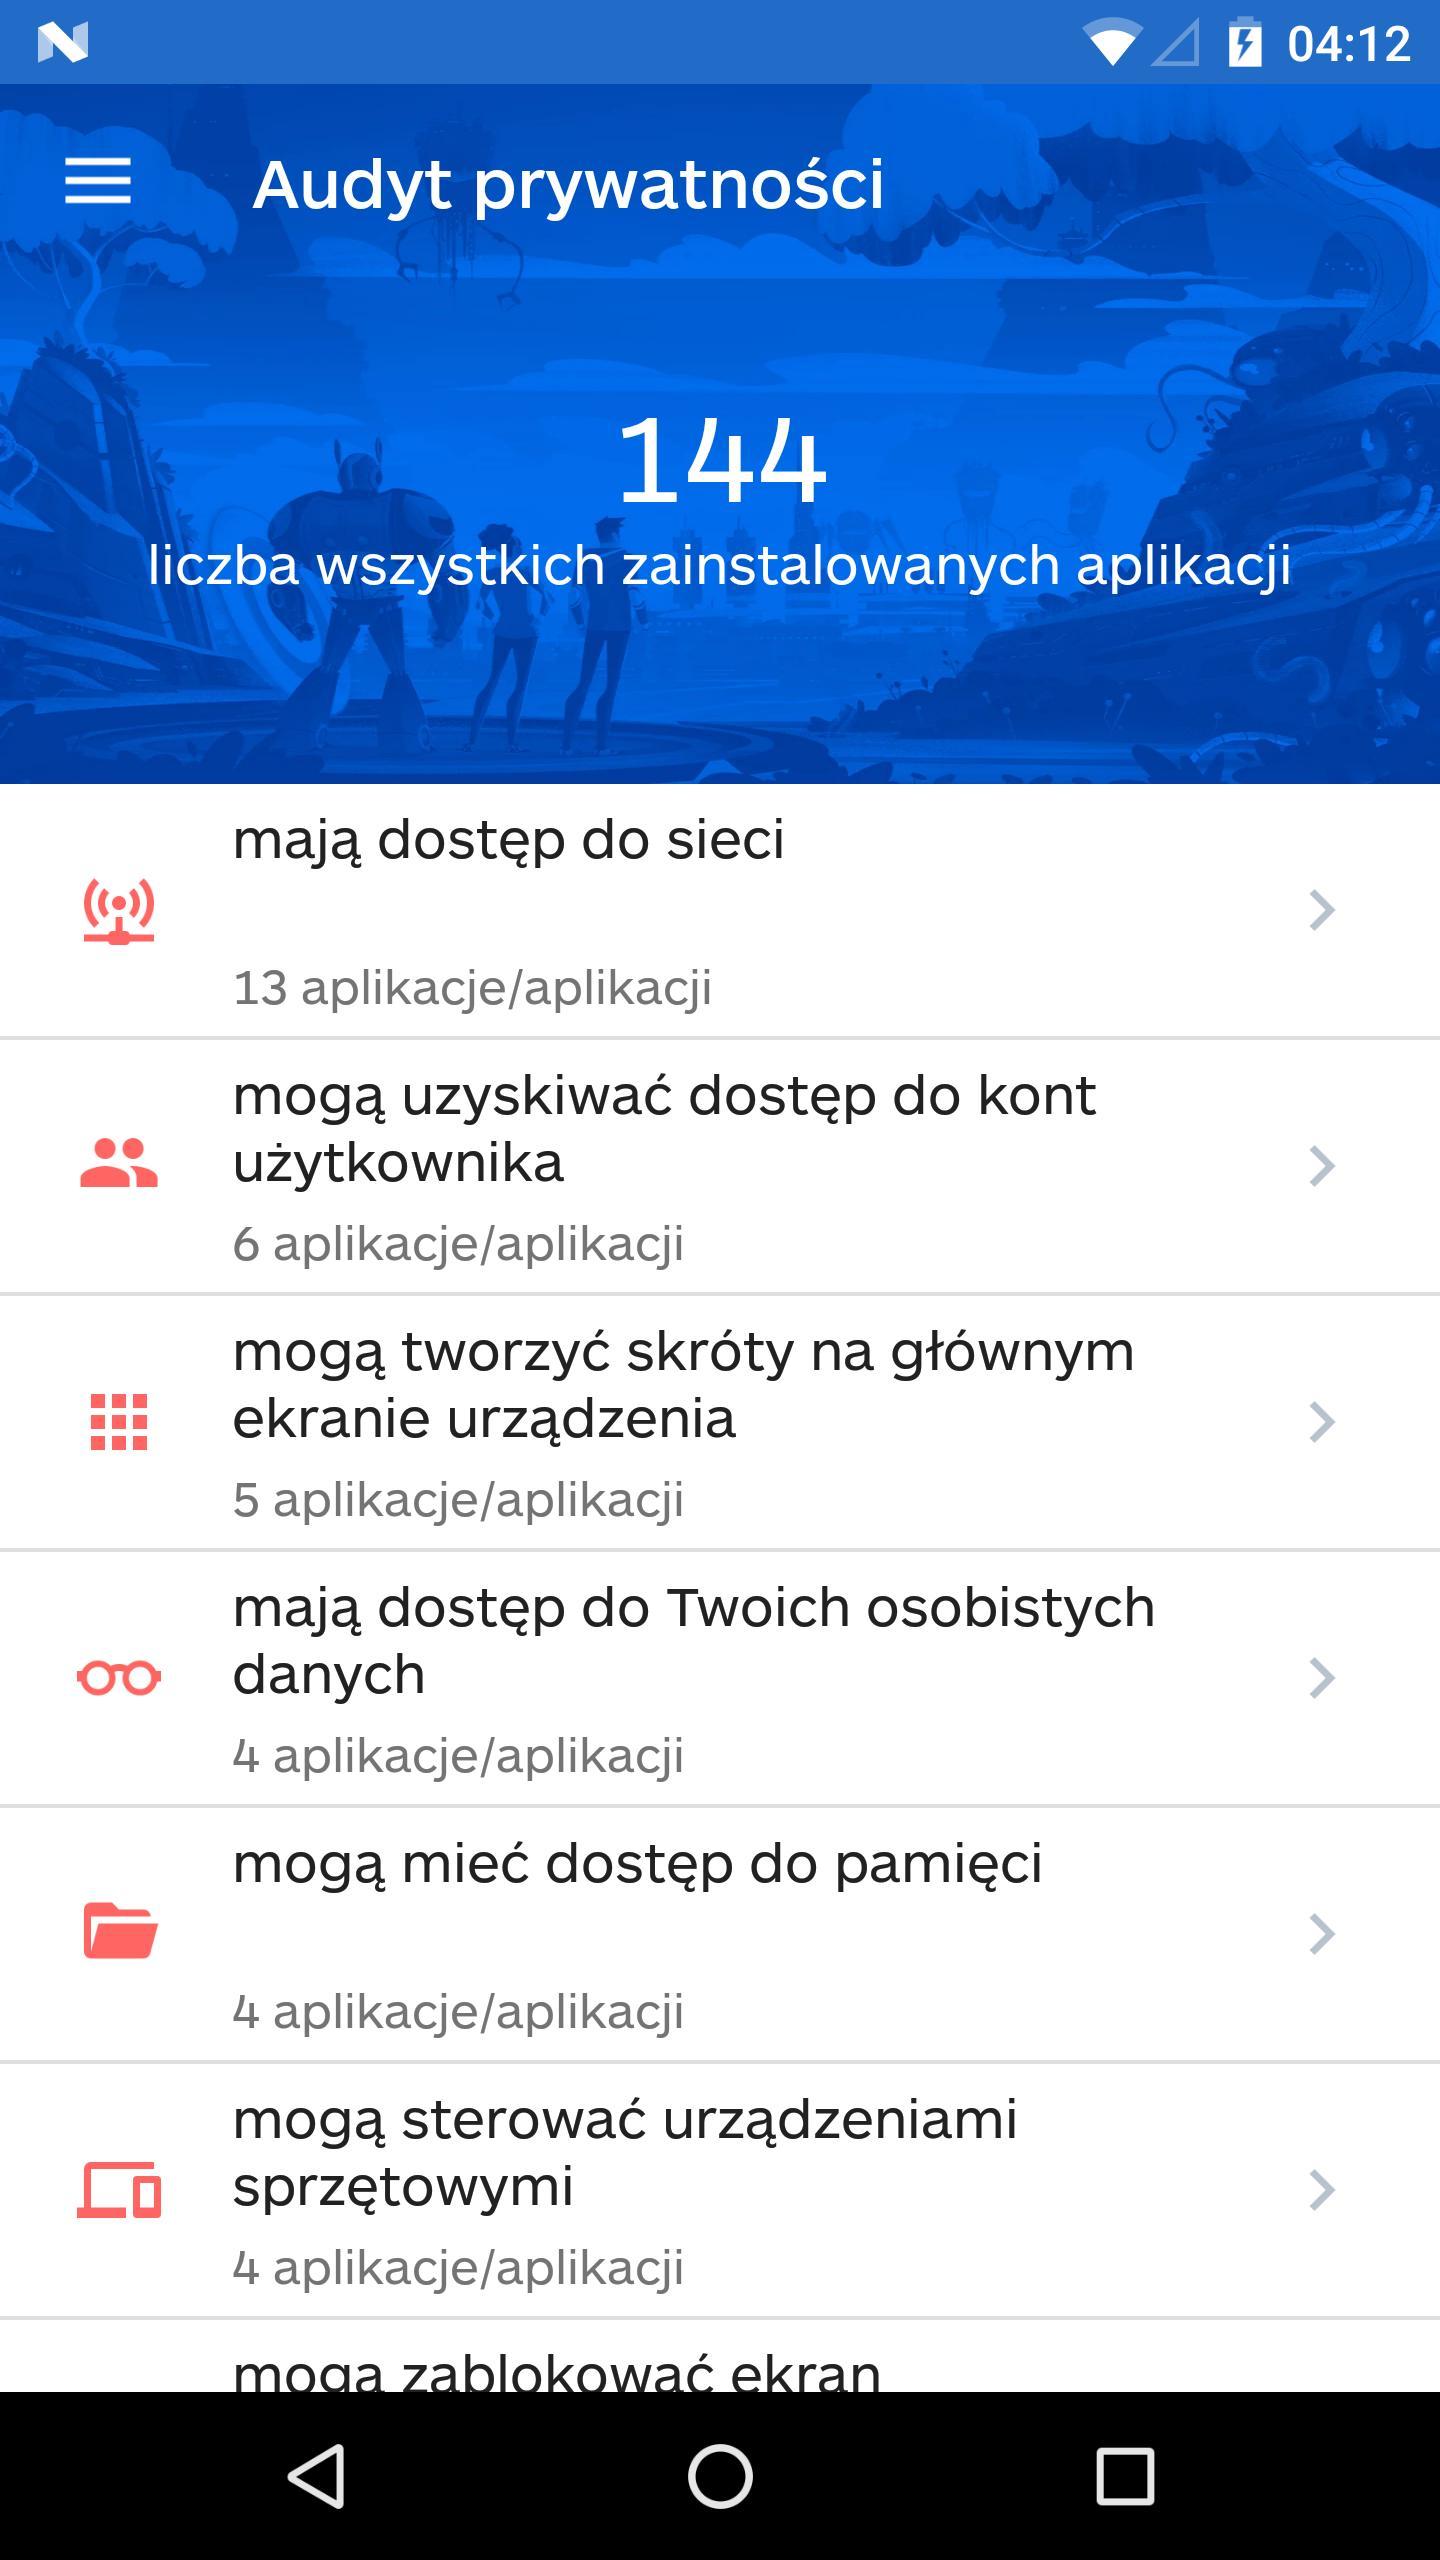 Ochrona Malwarebytes: Antywirus & Anti-Malware for Android